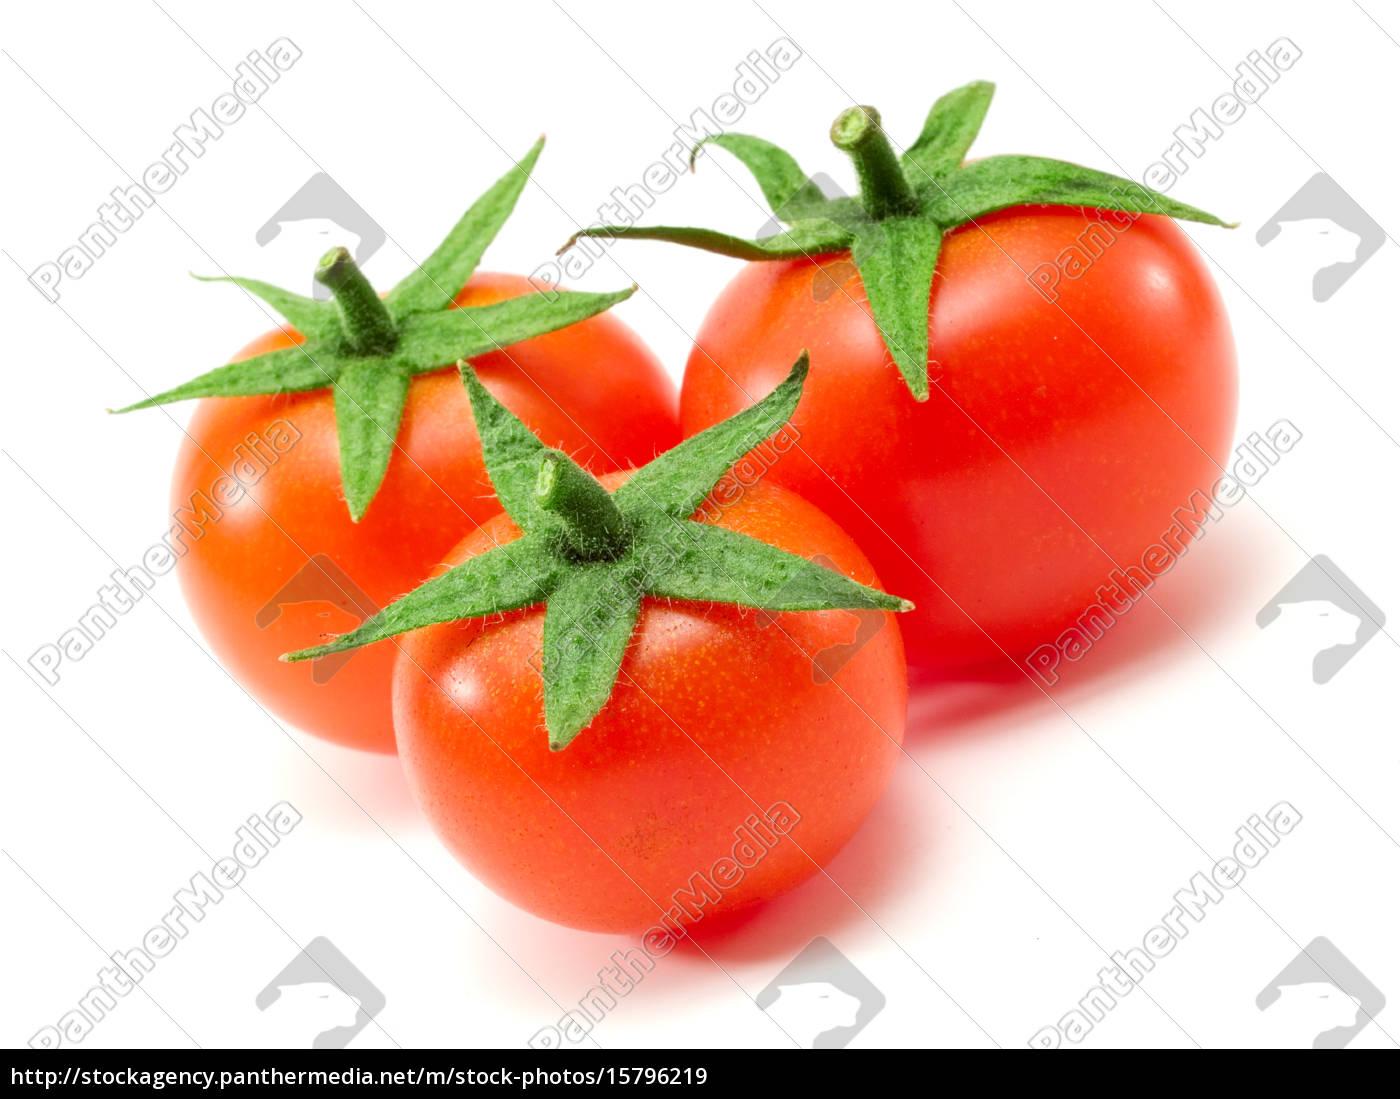 cherry, tomatoes, cherry, tomatoes, cherry, tomatoes, cherry, tomatoes - 15796219